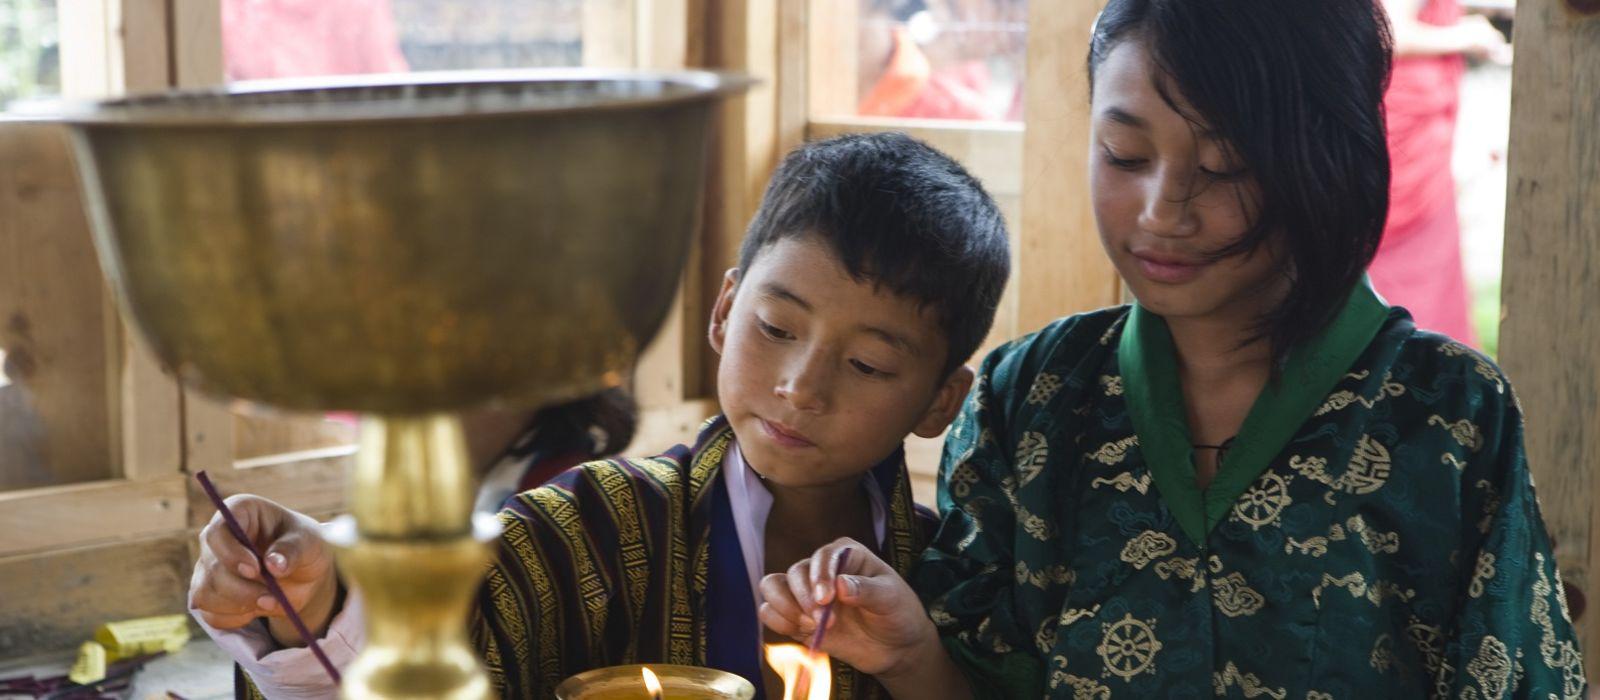 Amankora Exklusivangebot: Luxuriöses Bhutan Urlaub 5